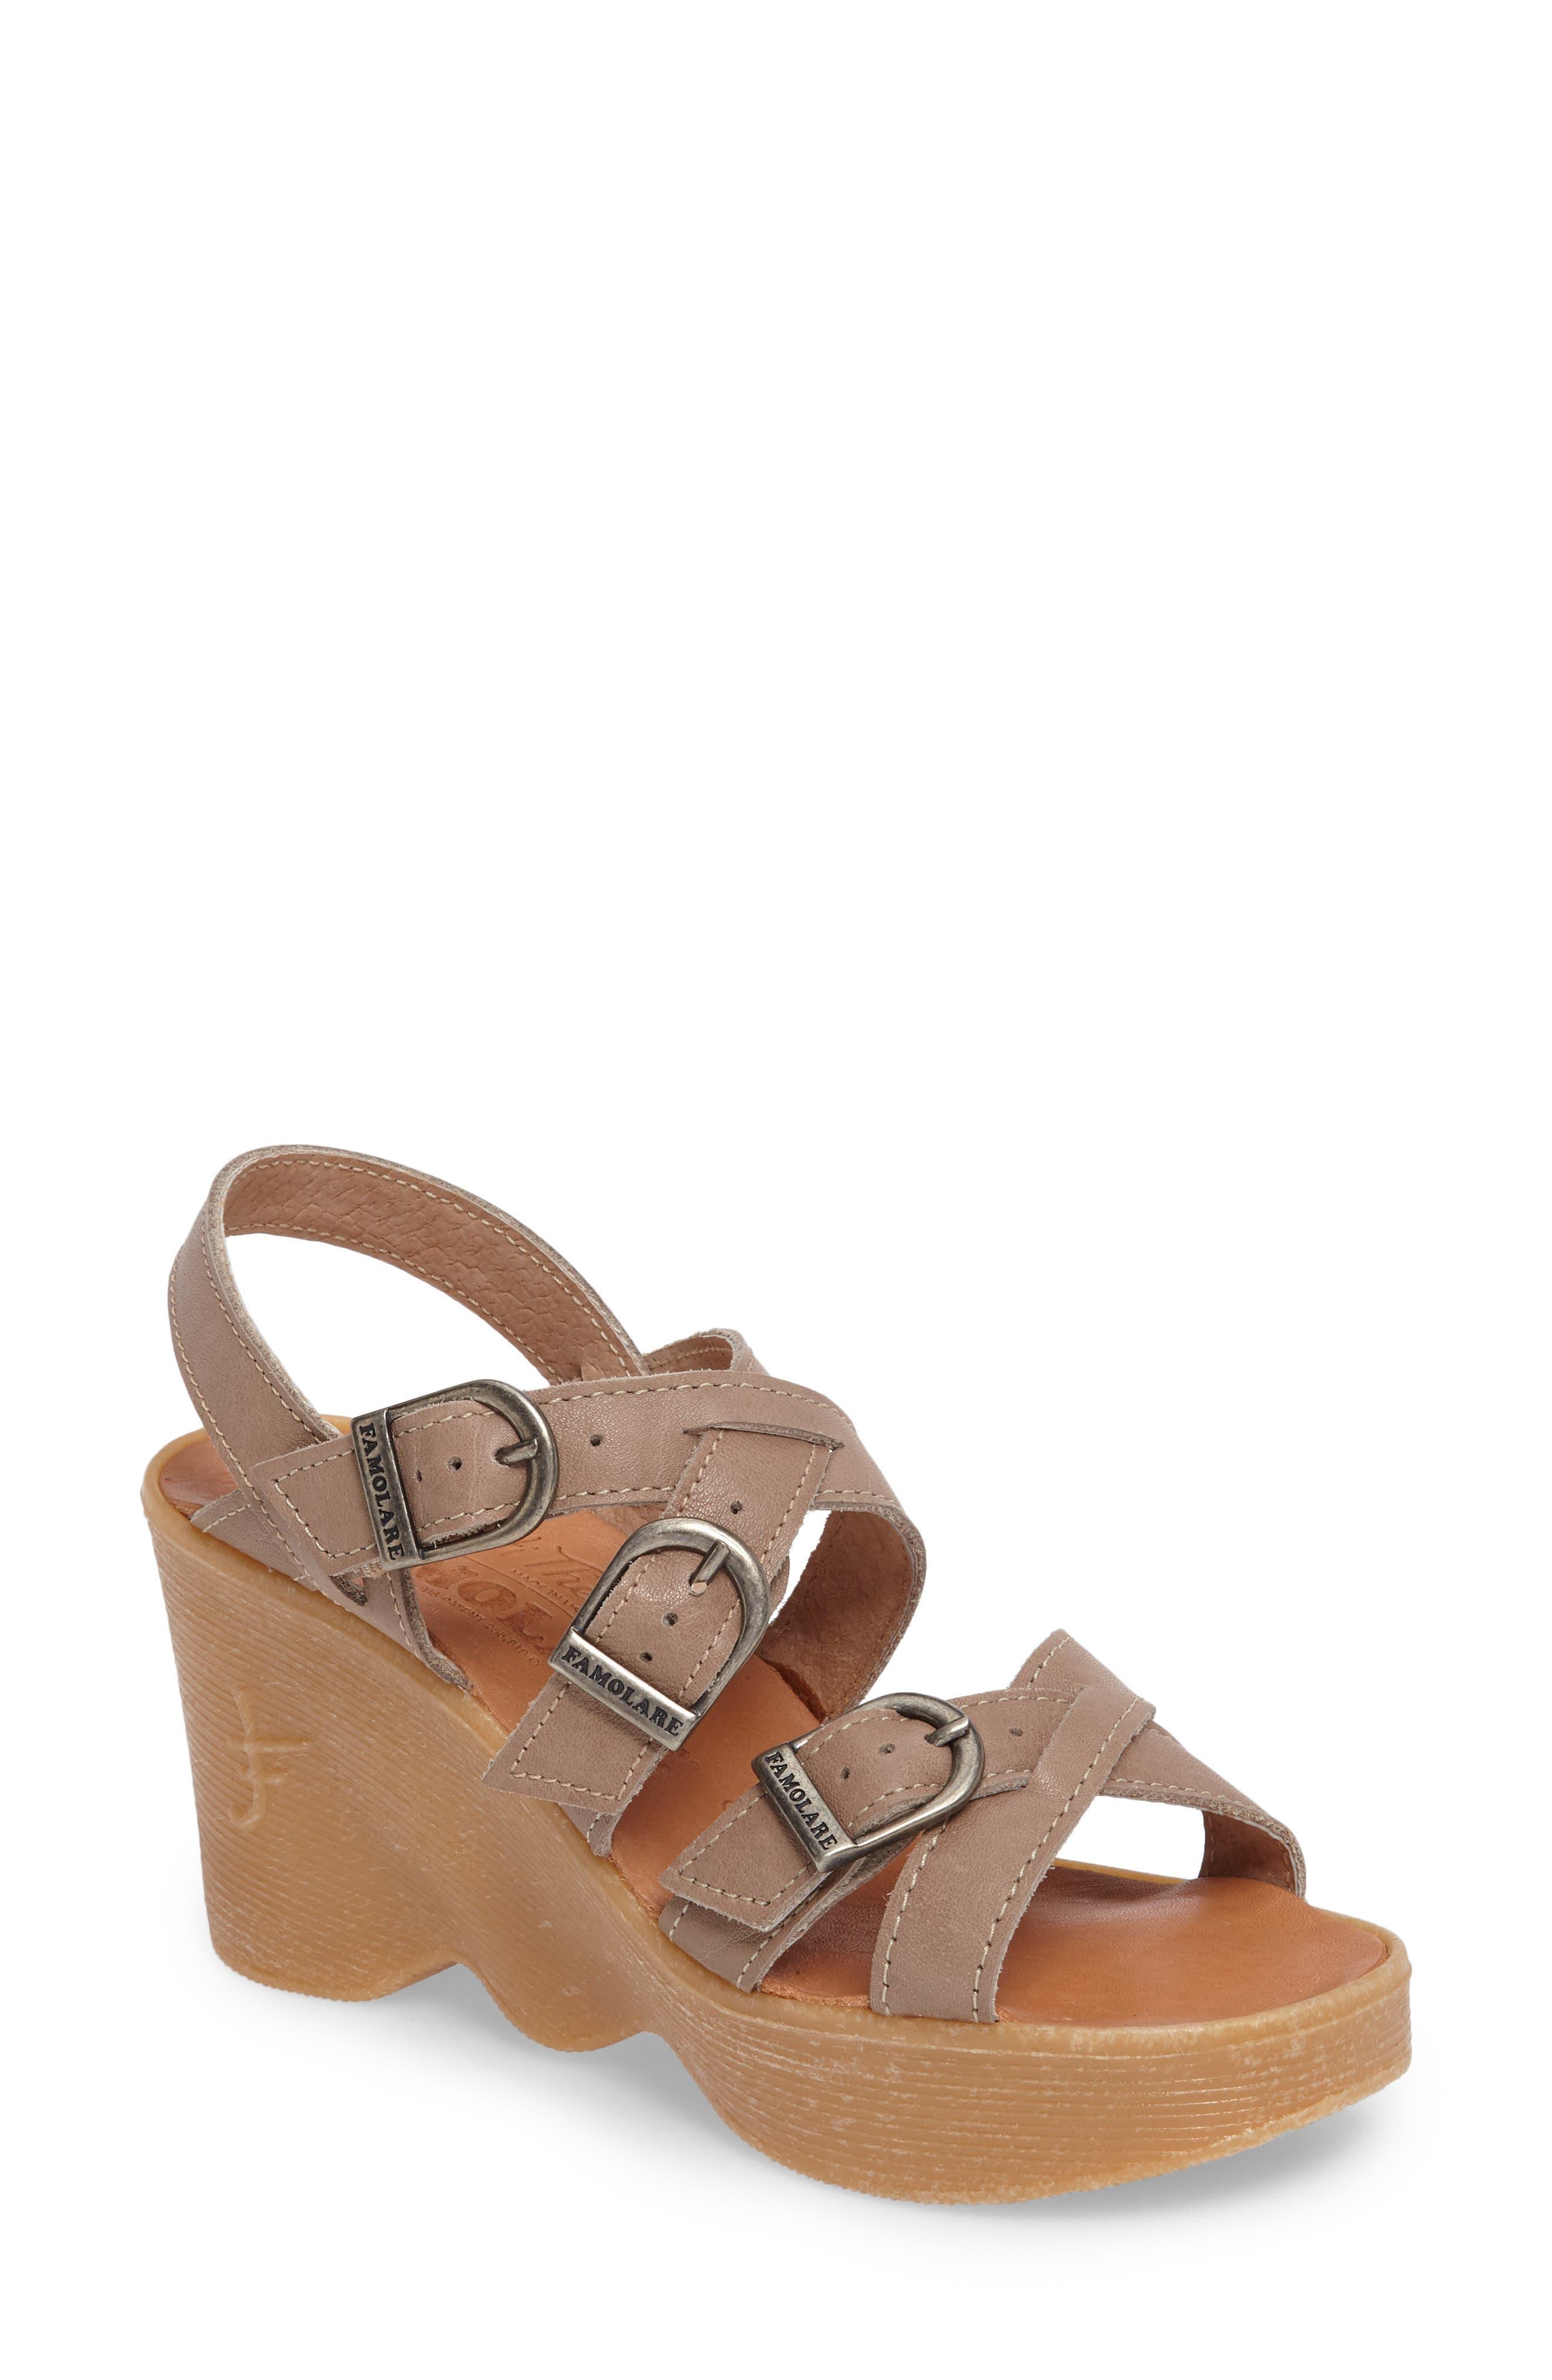 Main Image - Famolare Buckle Up Wedge Sandal (Women)